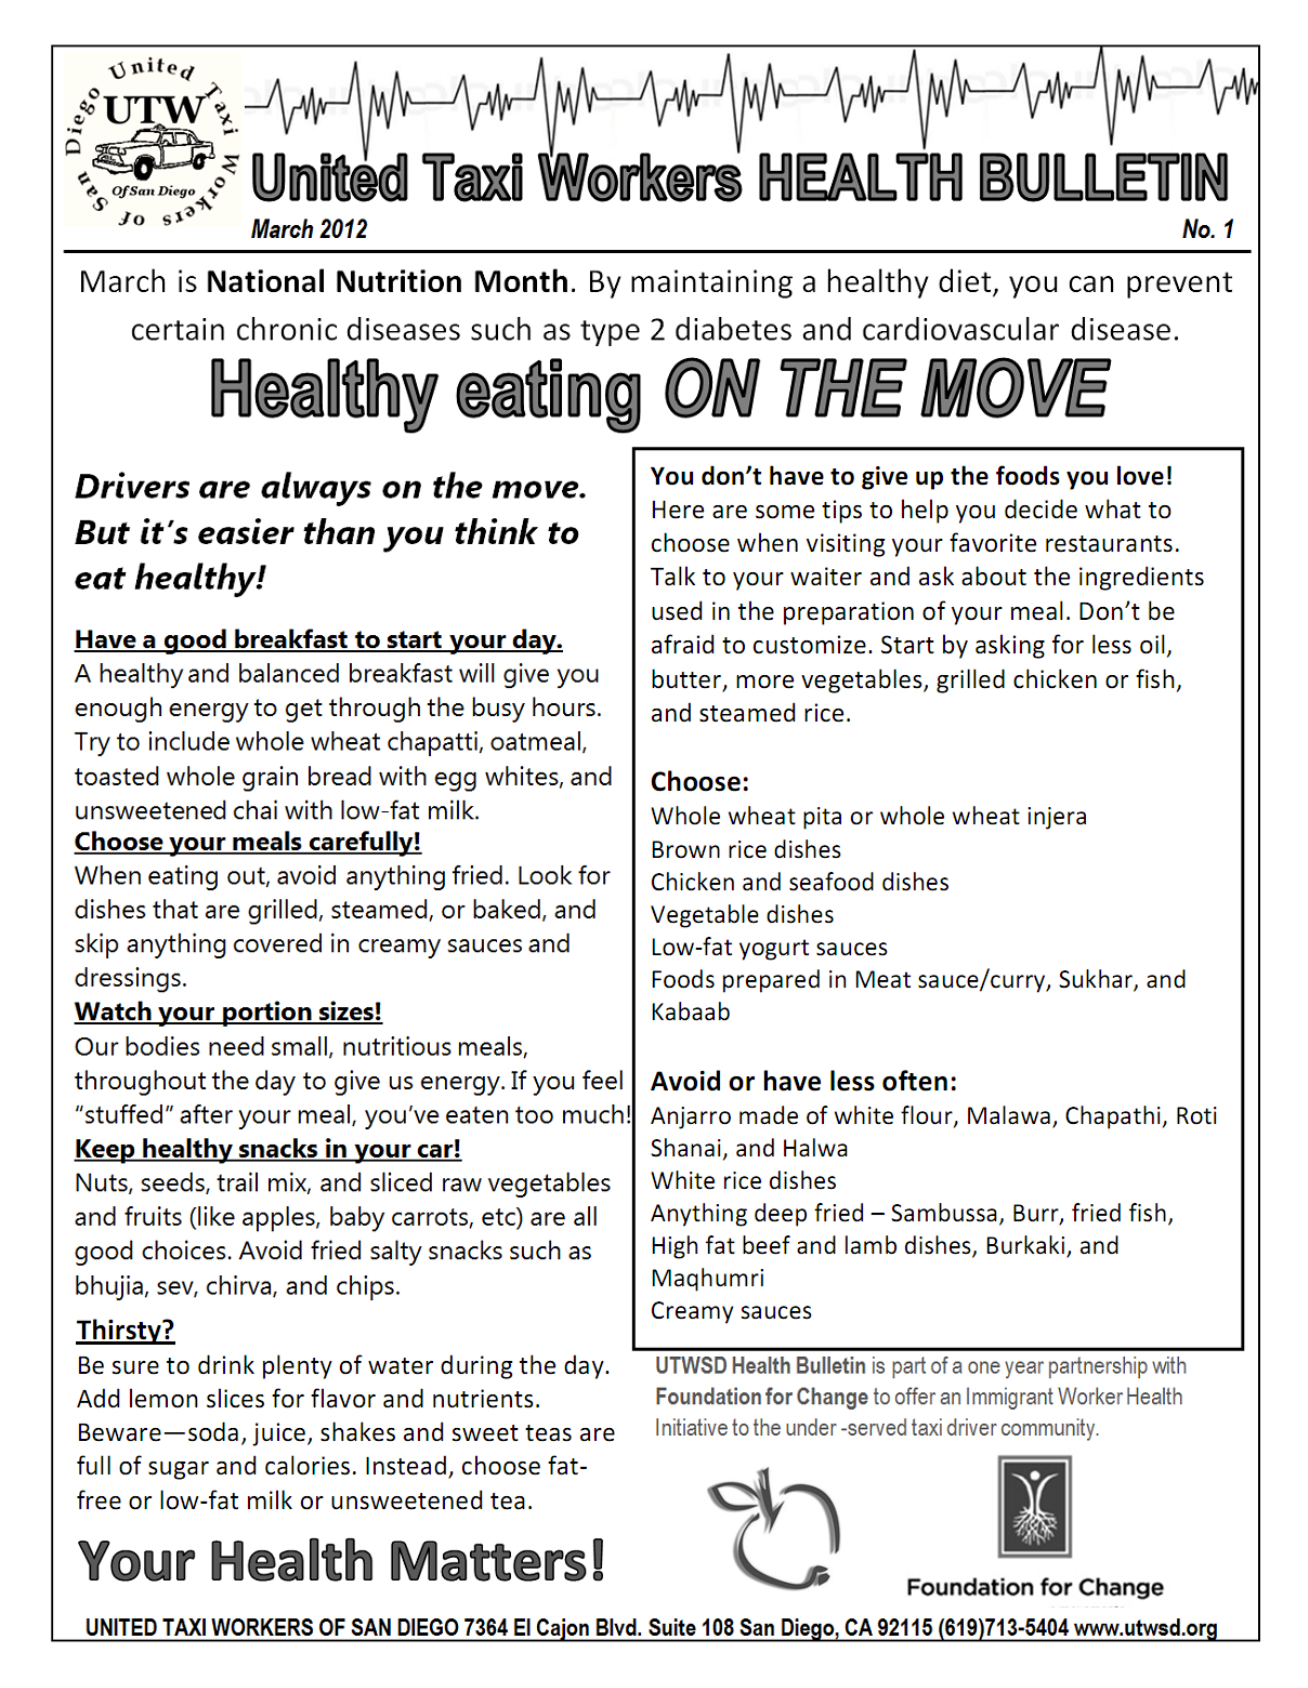 March 2012 Health Bulletin